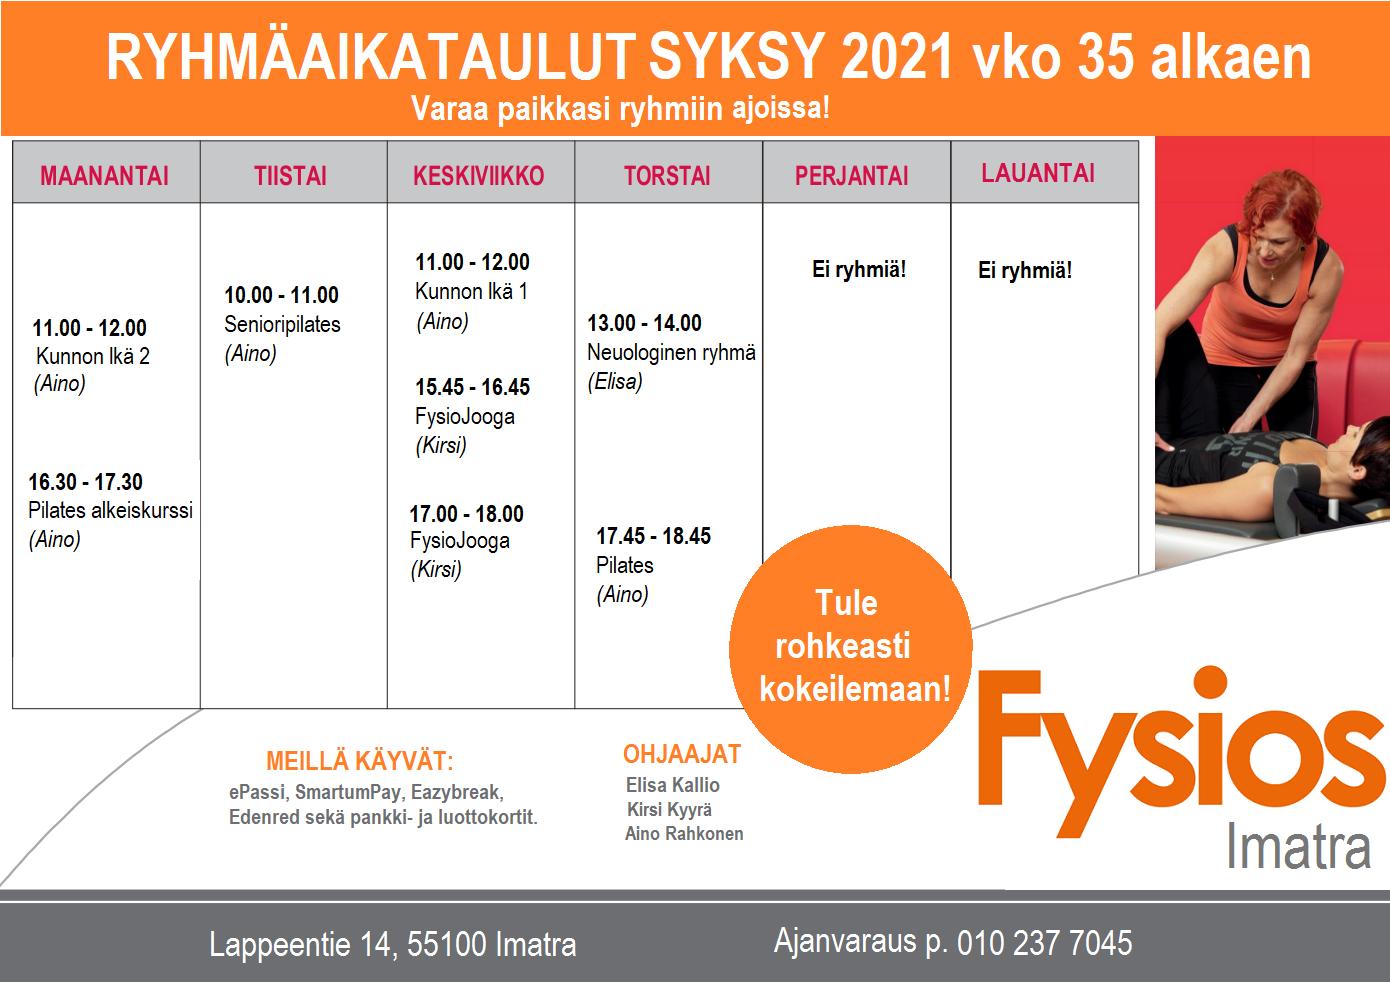 Fysios Imatra ryhmäaikataulu syksy 2021